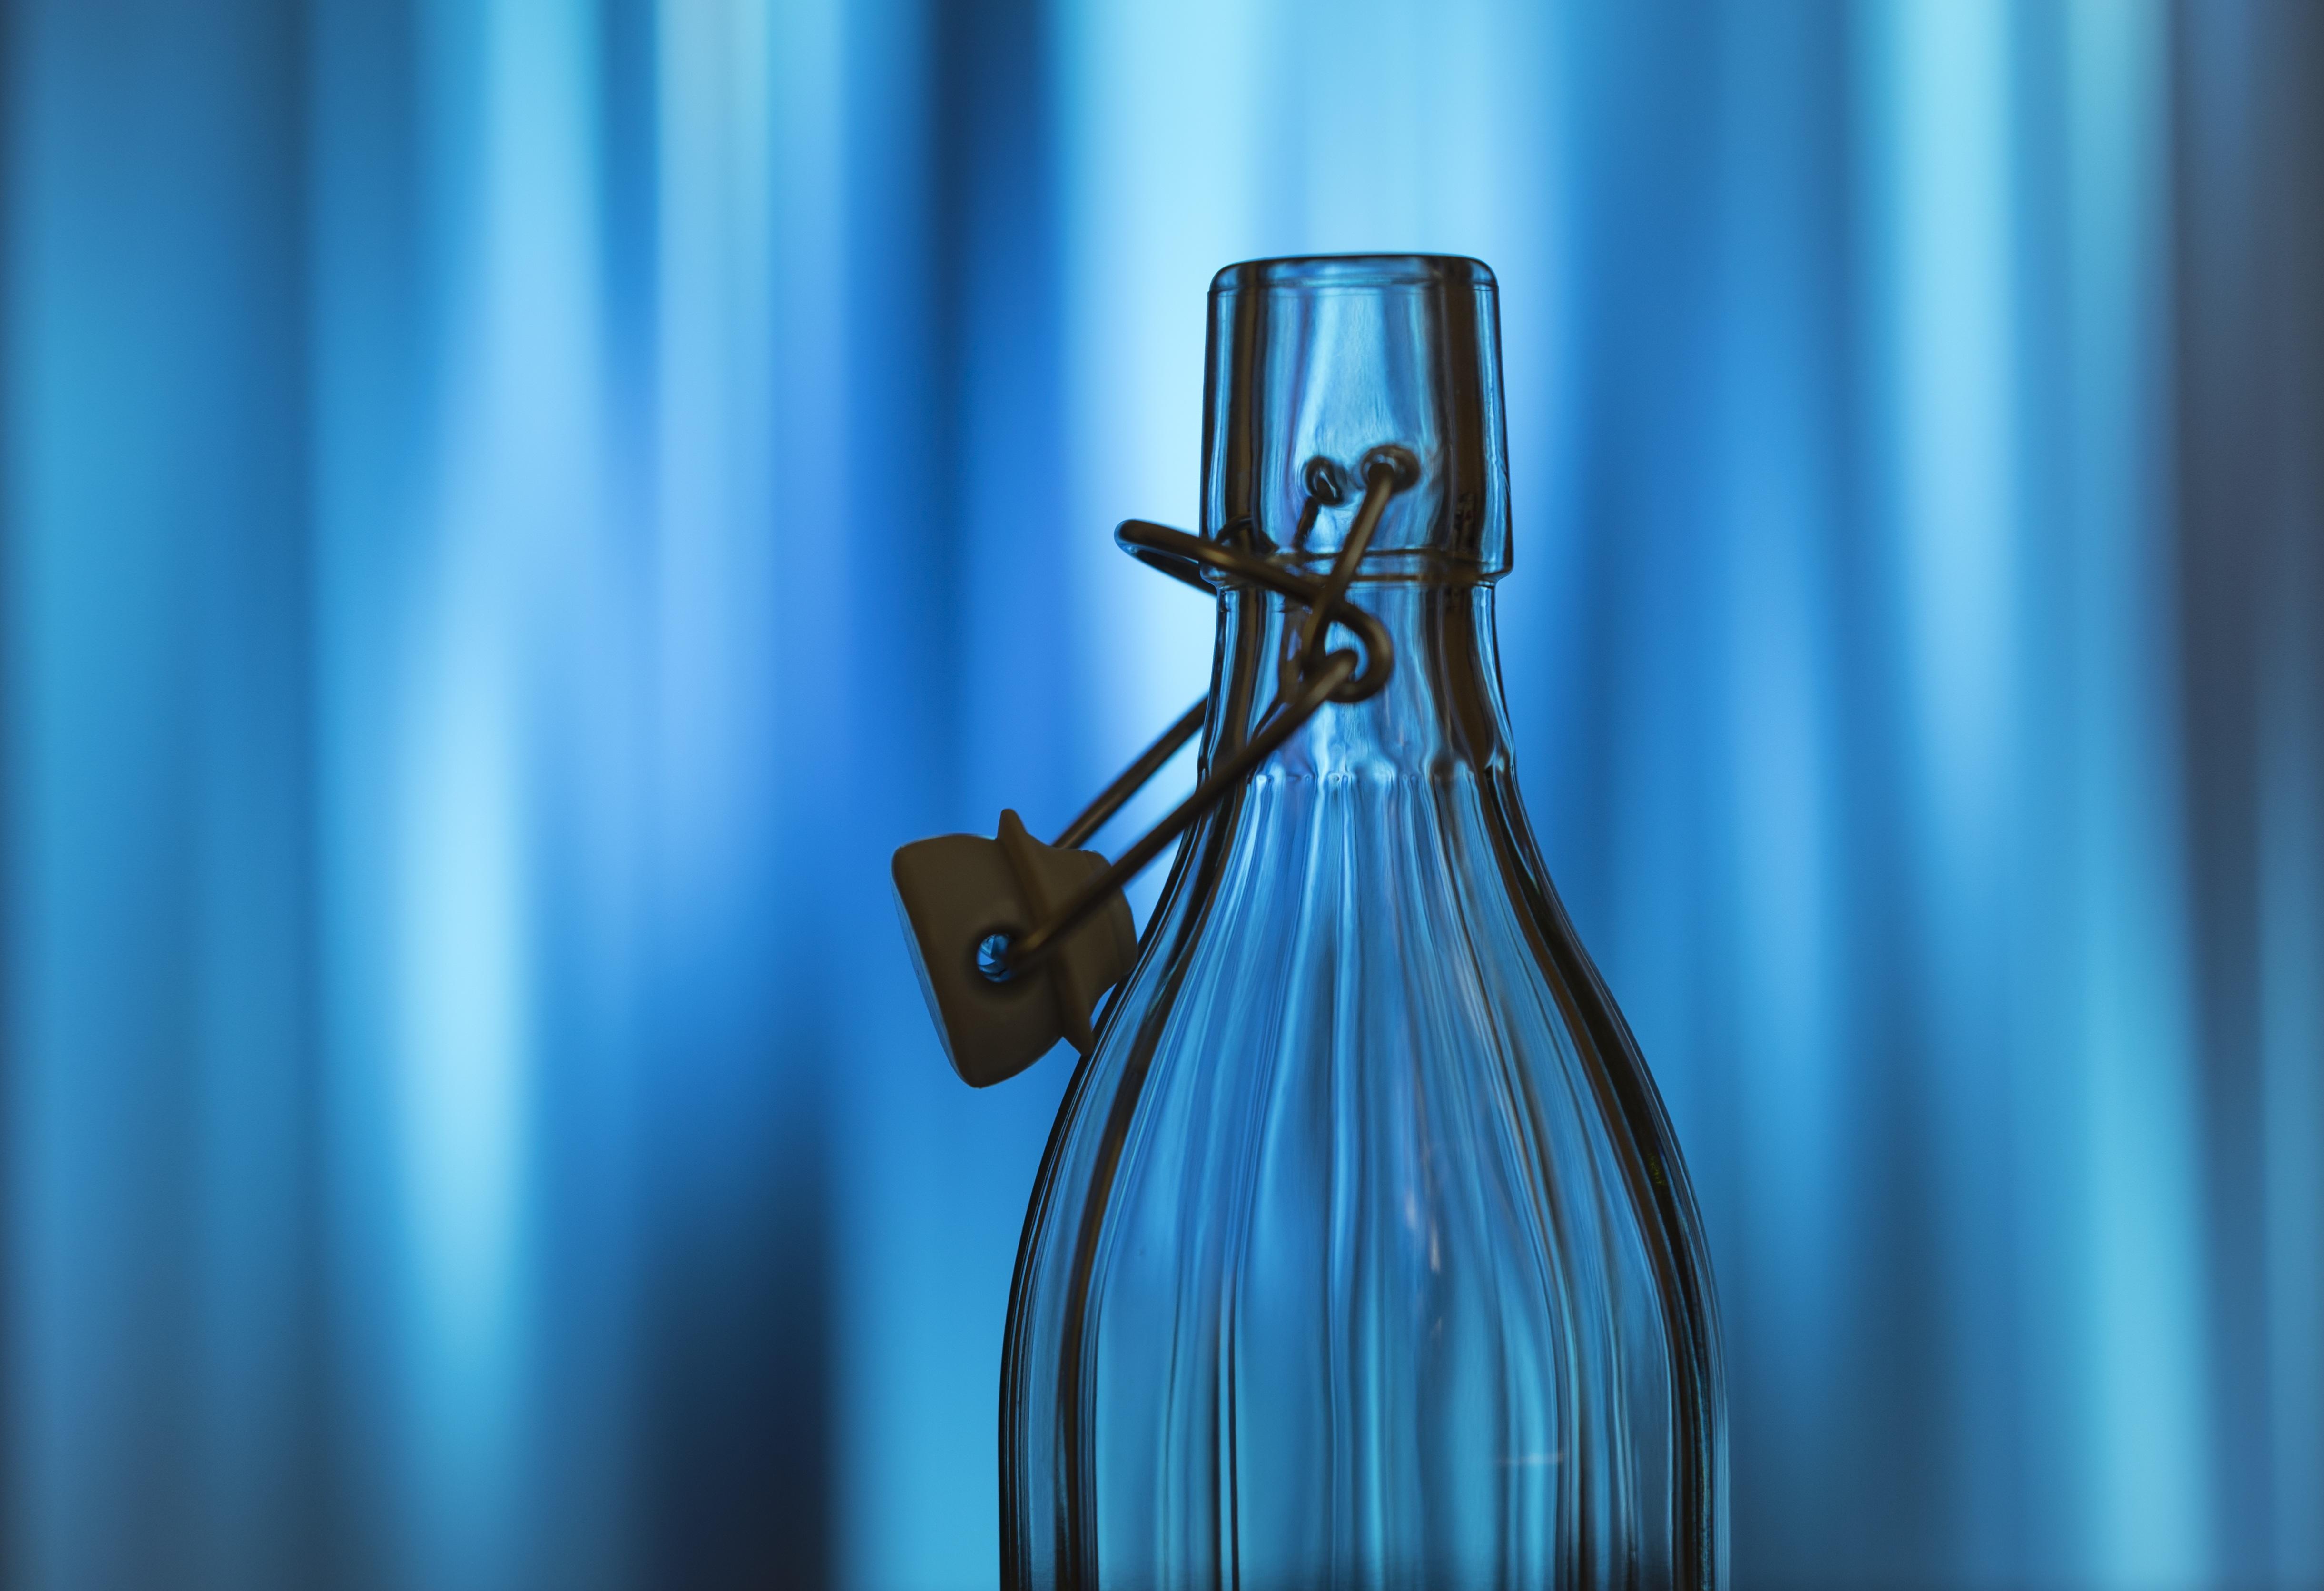 Free stock photo of art, creative, blue, glass